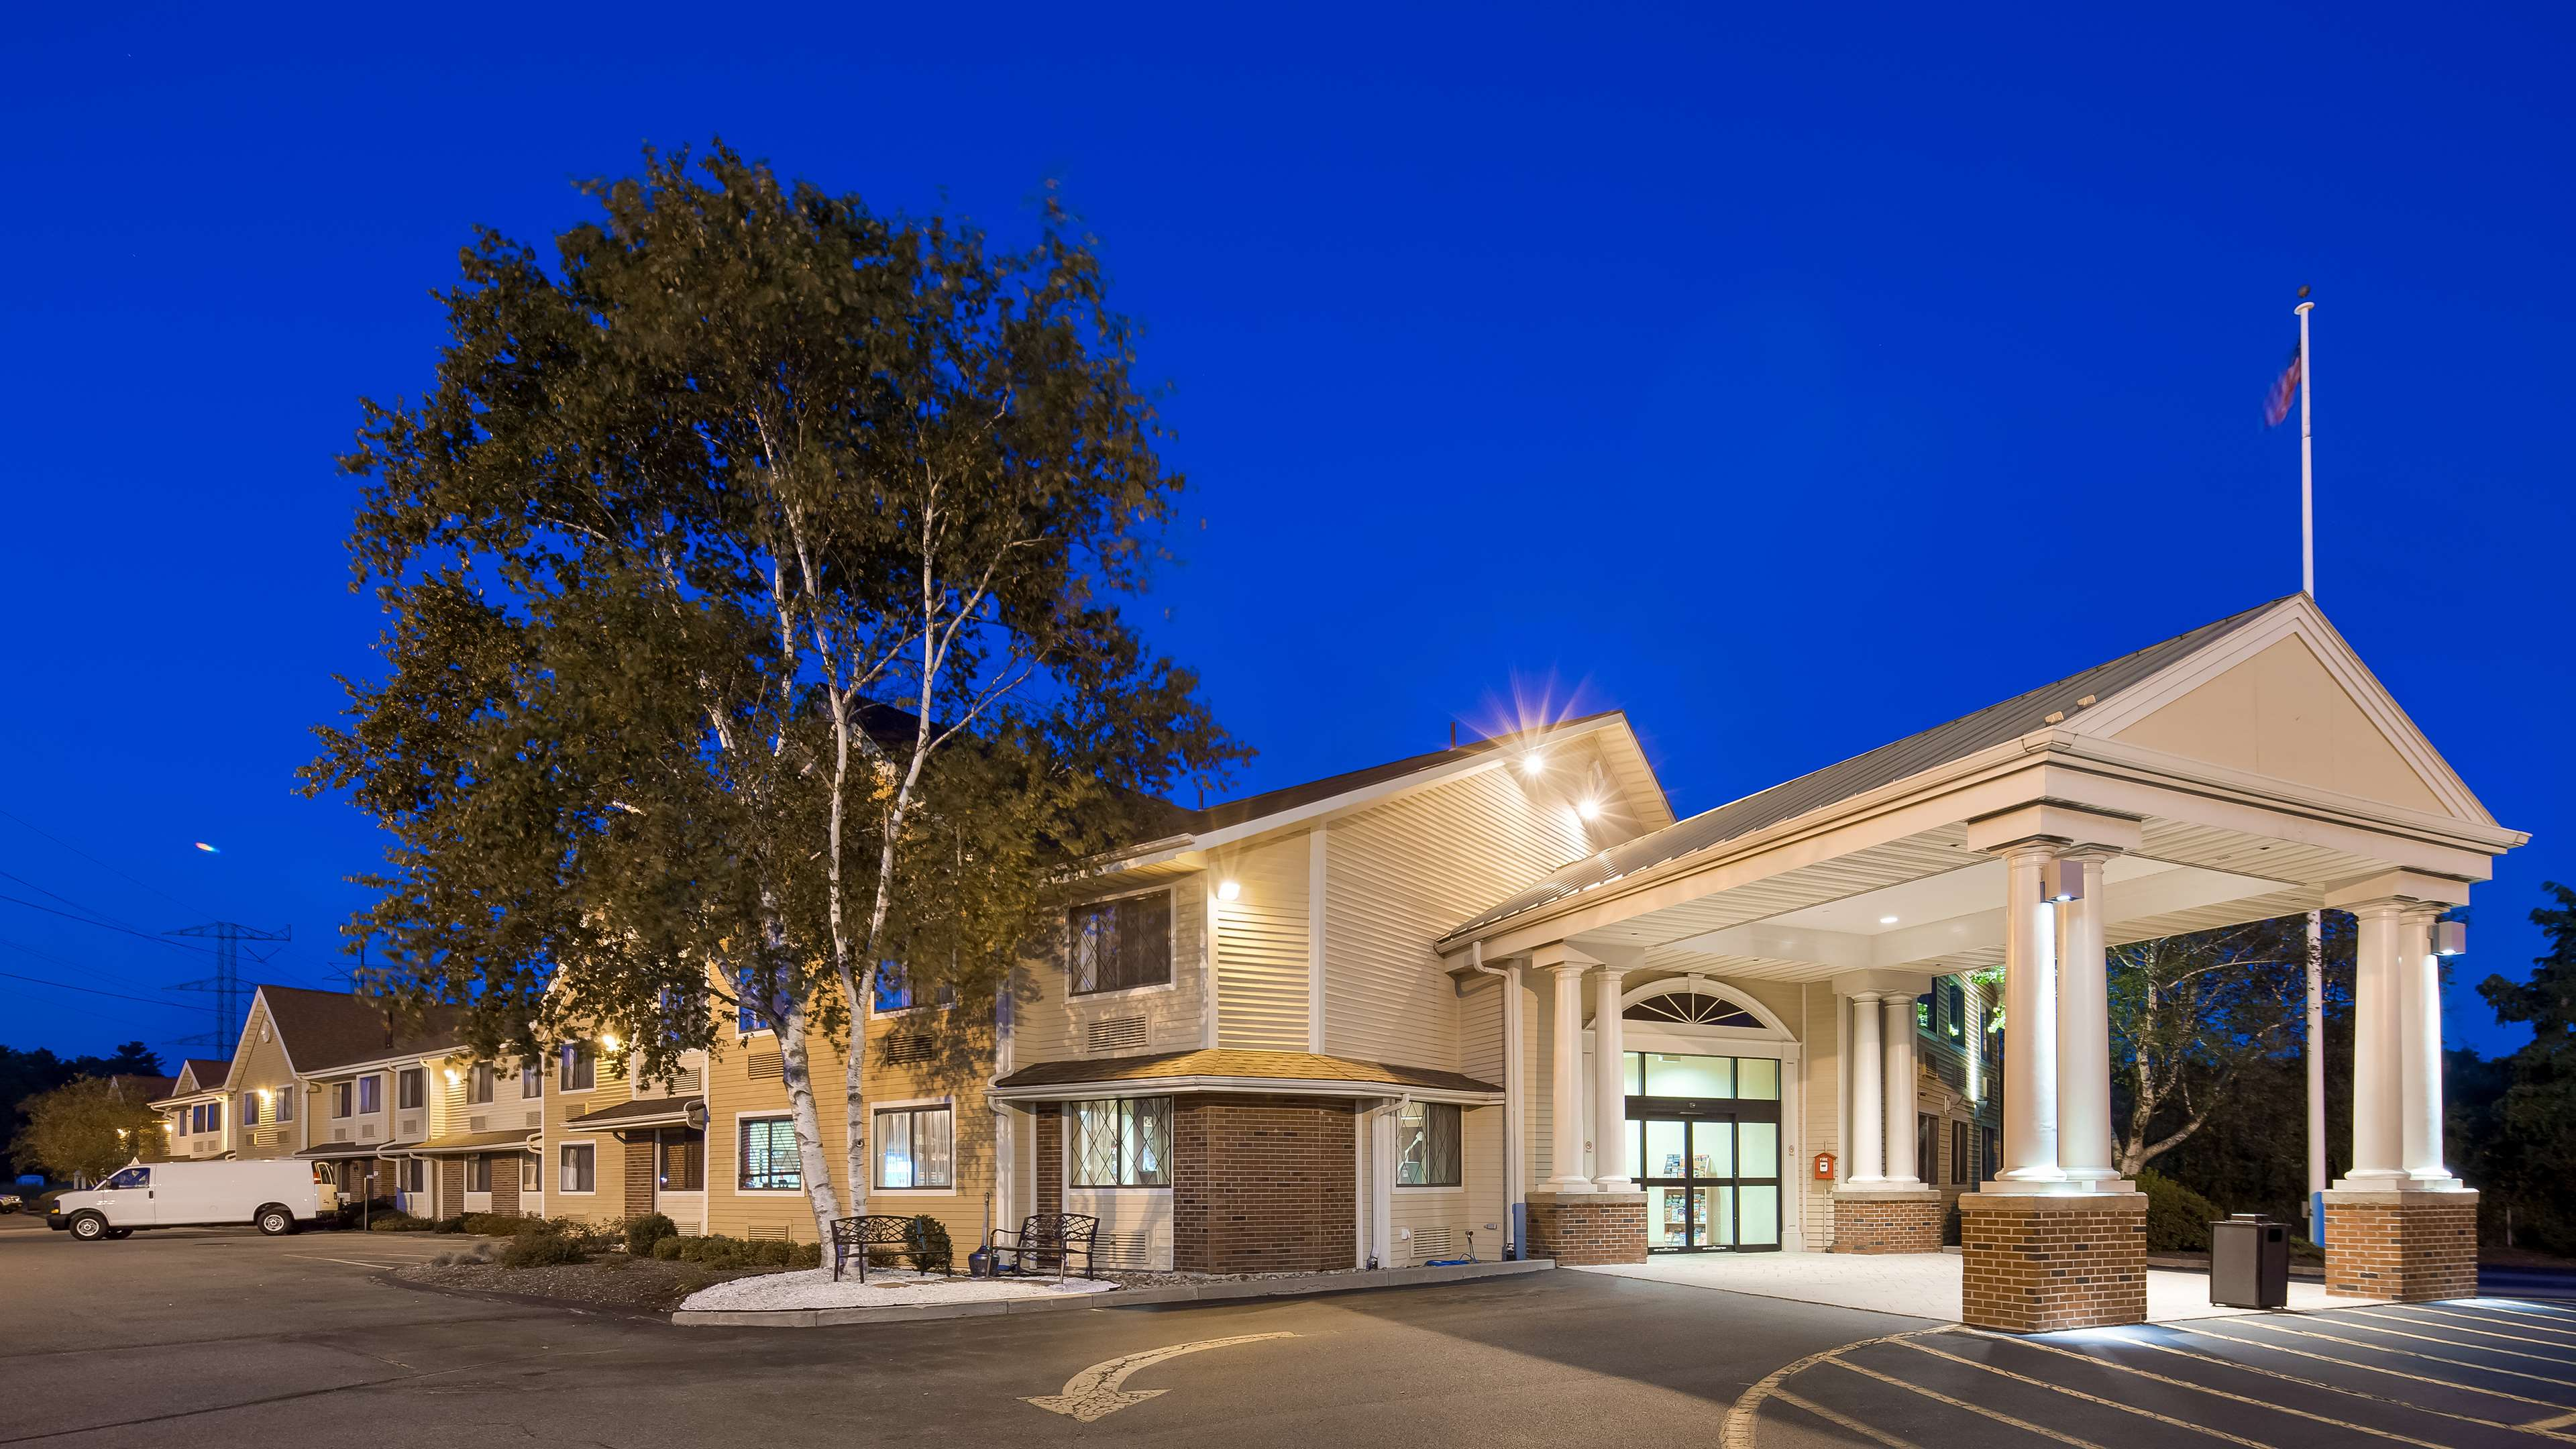 Best Western Plus The Inn at Sharon/Foxboro image 1